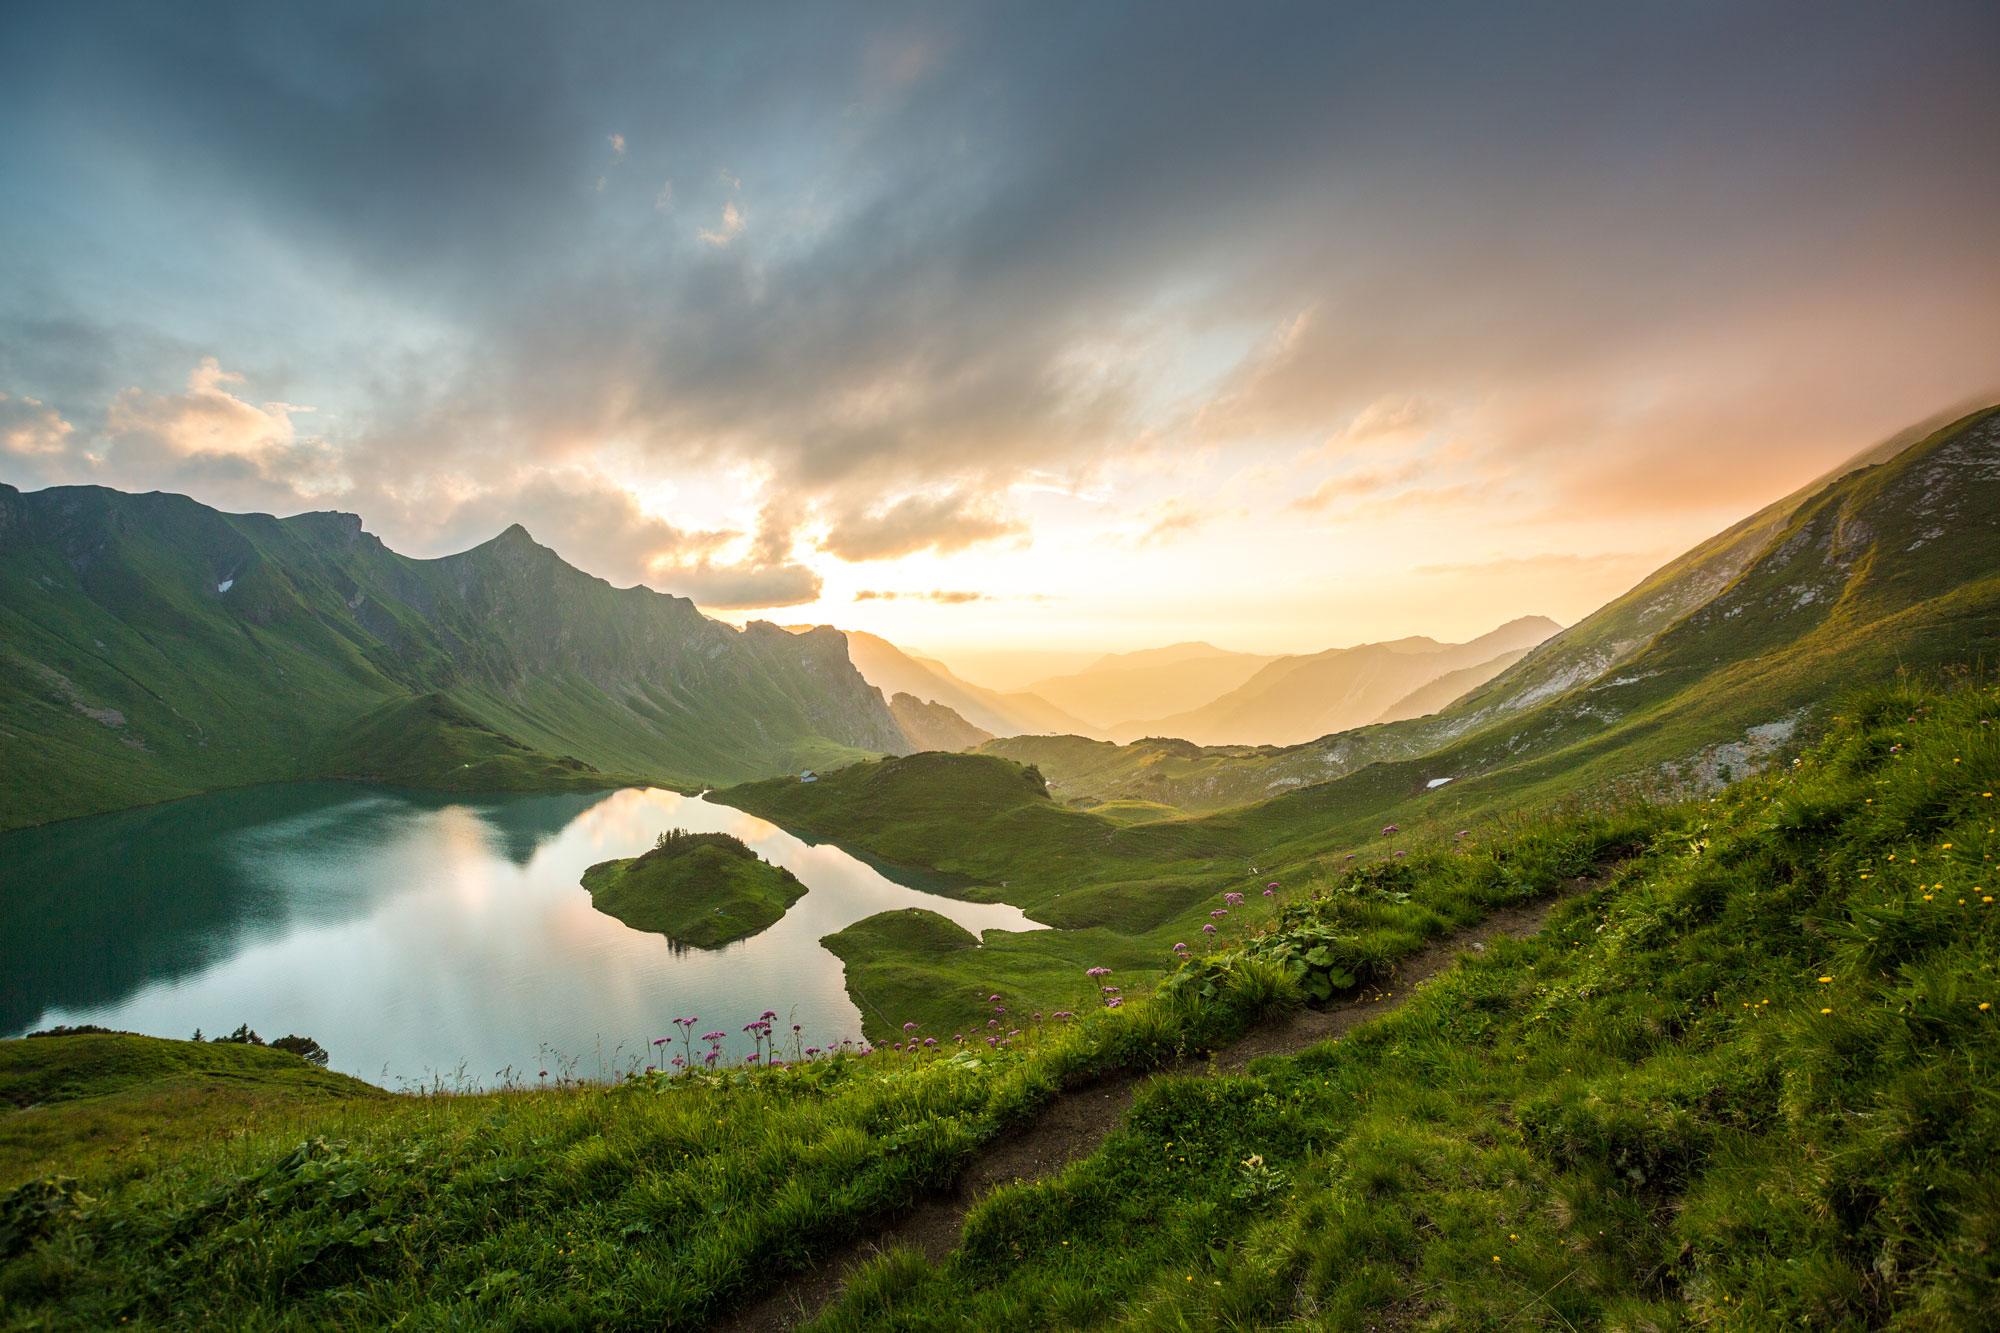 Imposante Landschaftseindrücke auf Etappe 2 © Erika Spengler